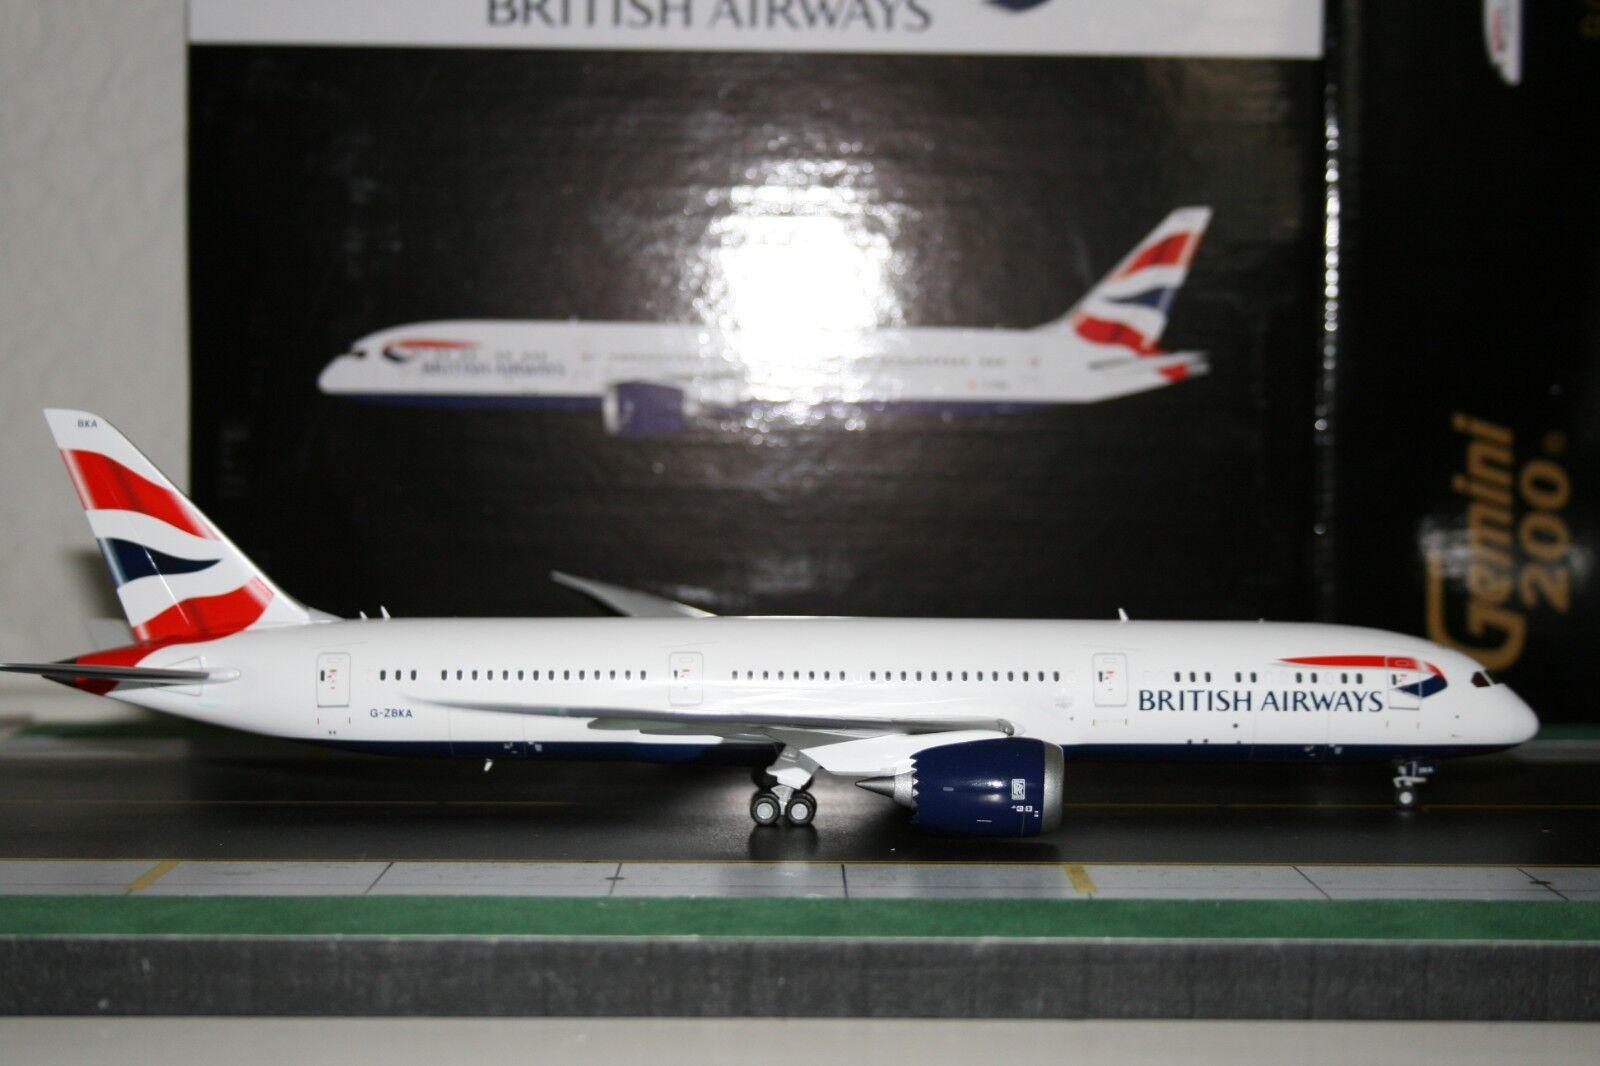 Gemini Jets 1 200 British Airways Boeing 787-9 G-ZBKA (G2BAW544) Model Plane